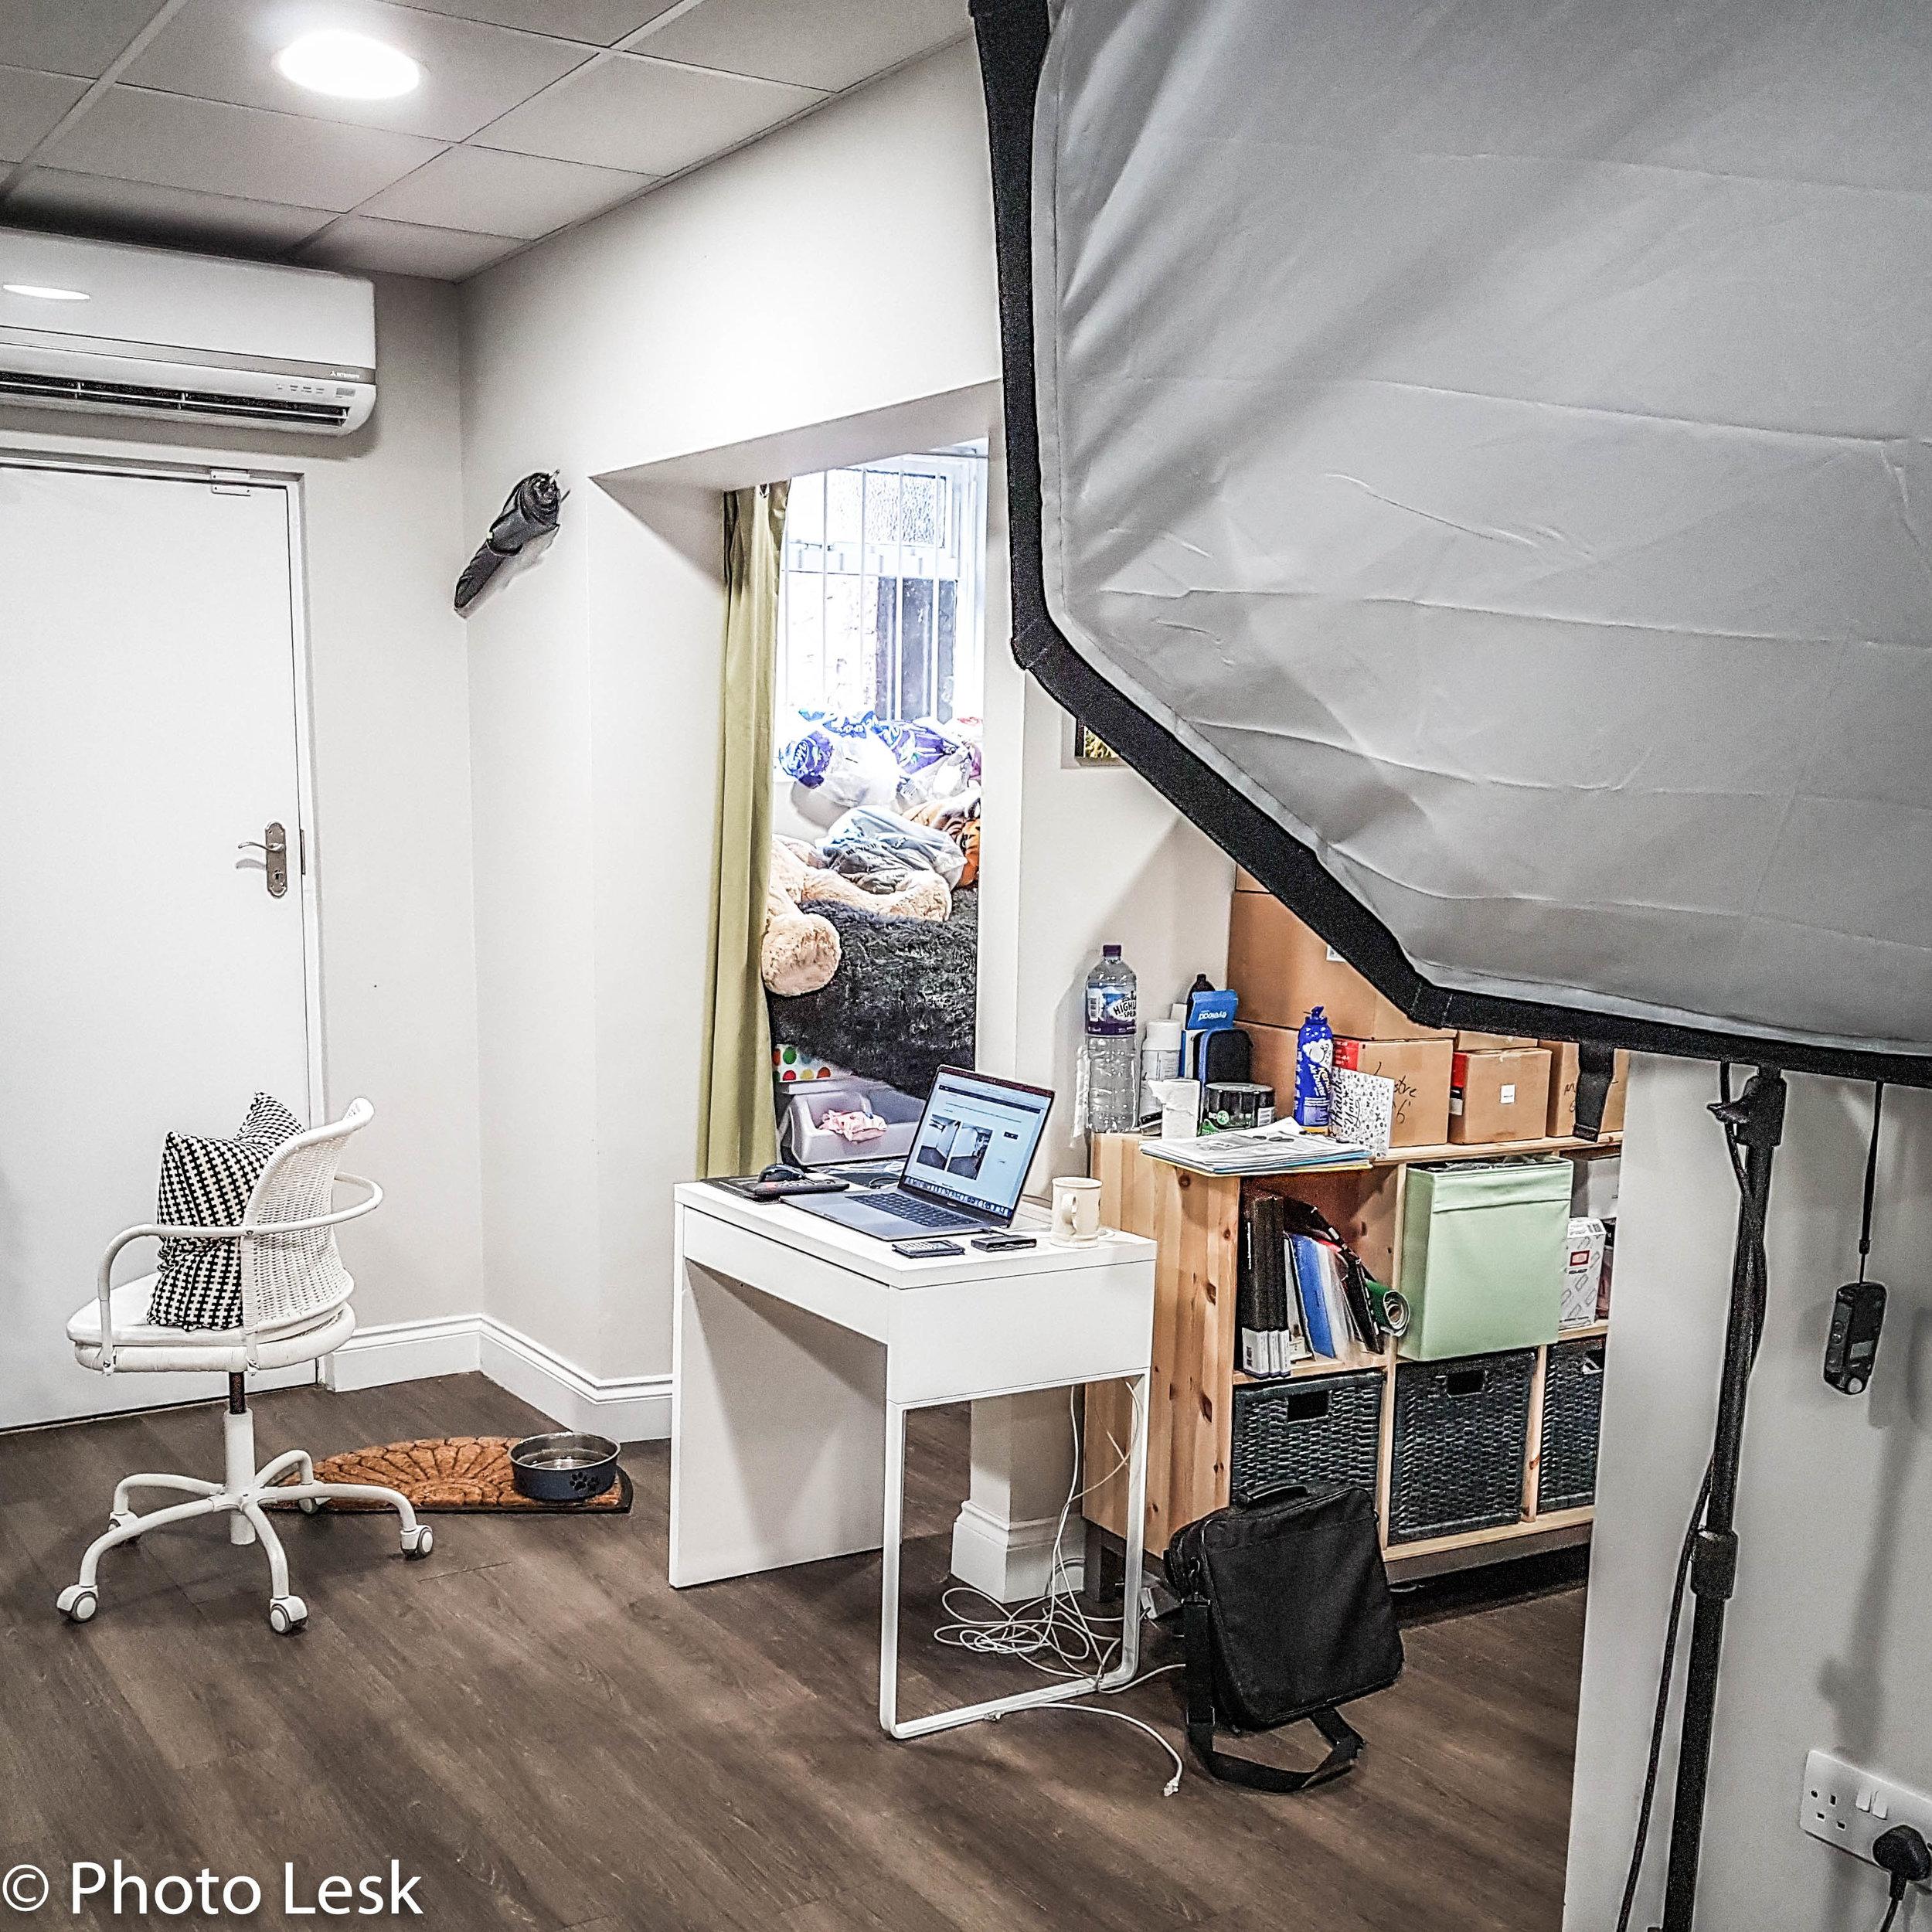 photography-studio-hire-devon-t&c.jpg